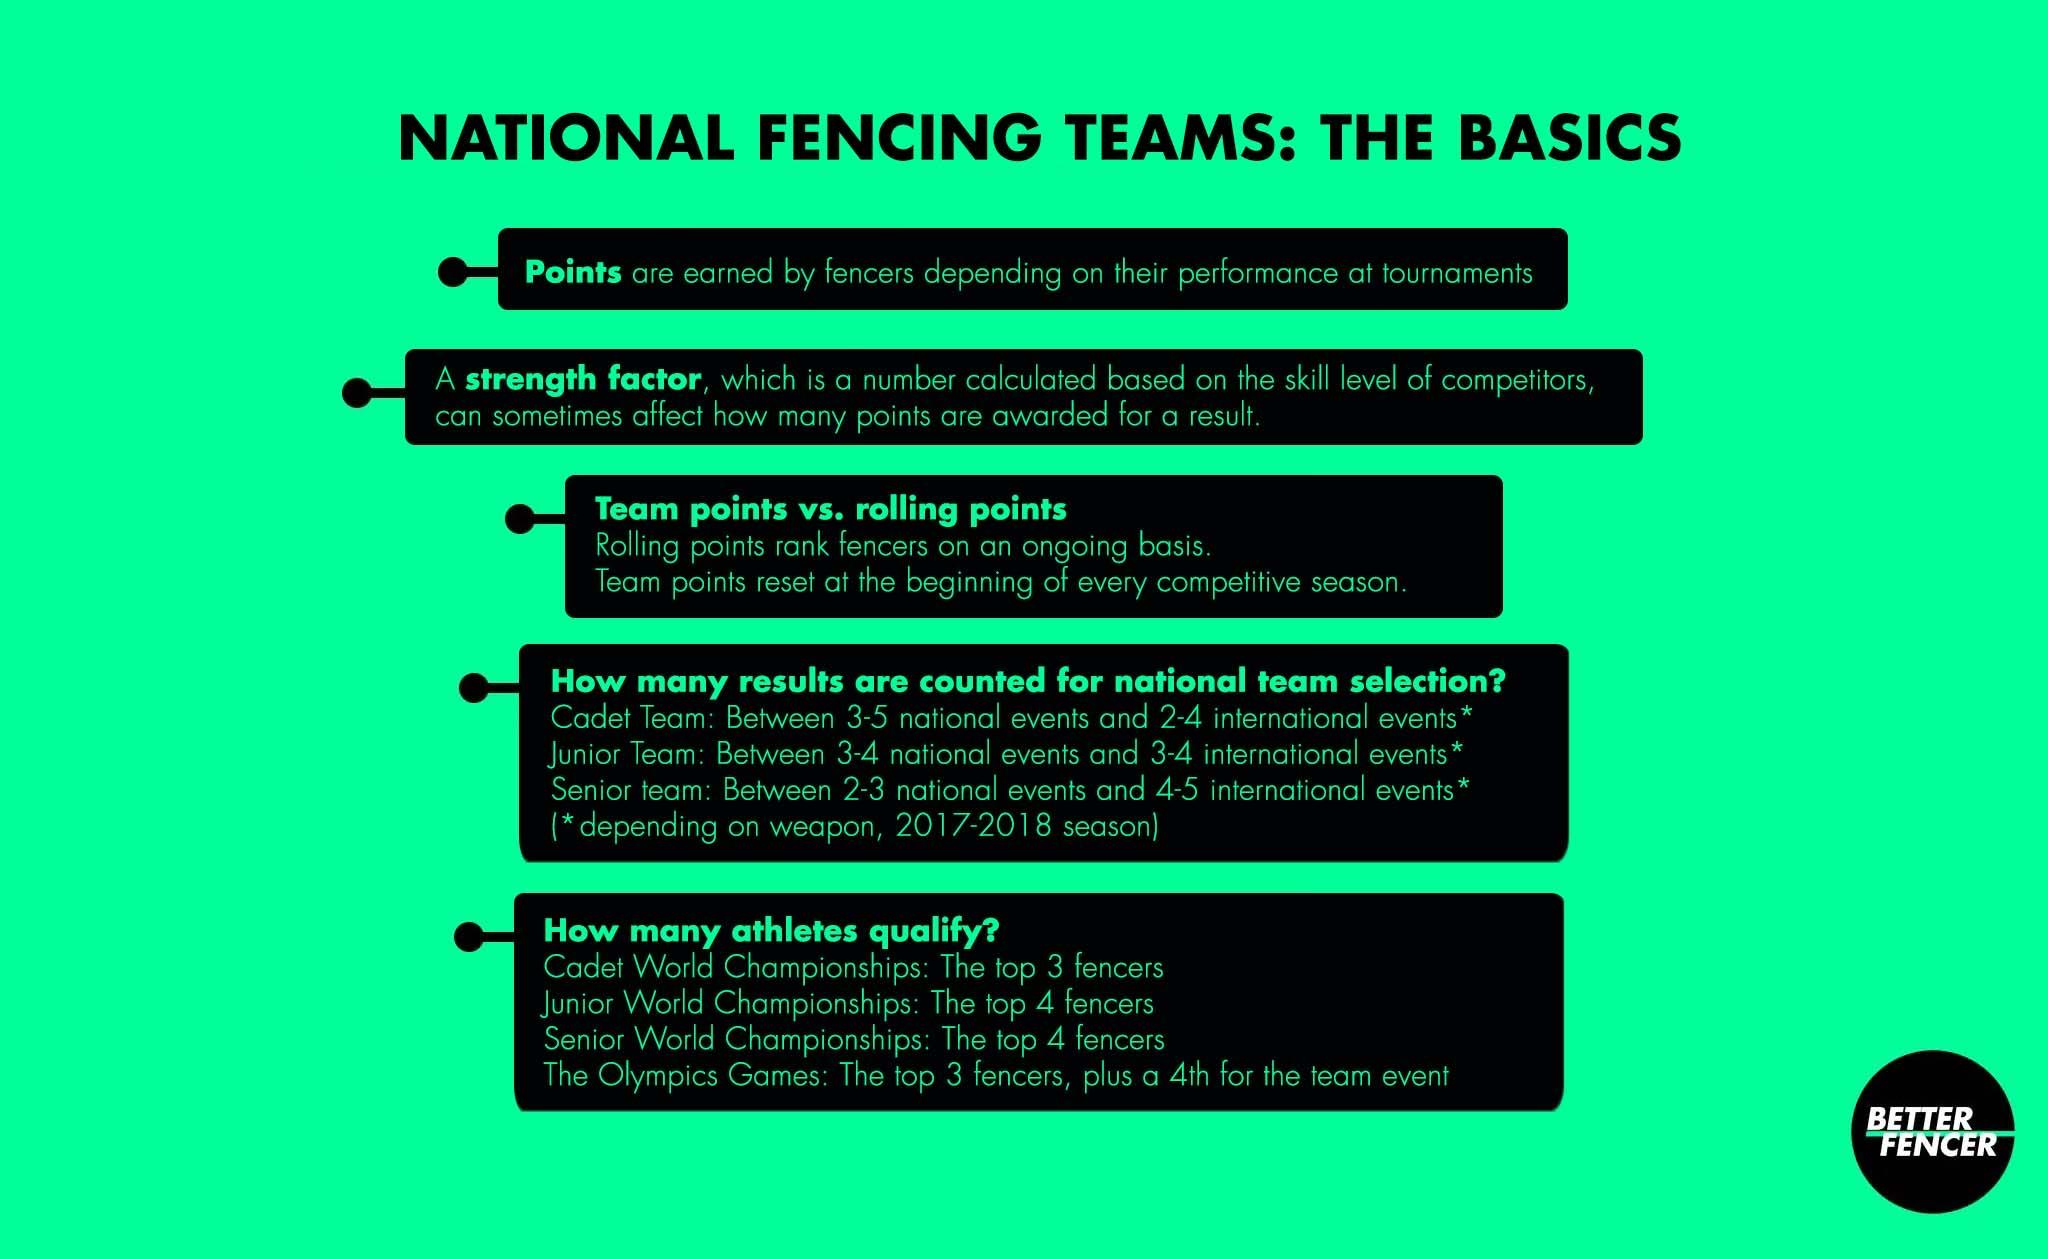 US national fencing world team qualification basics